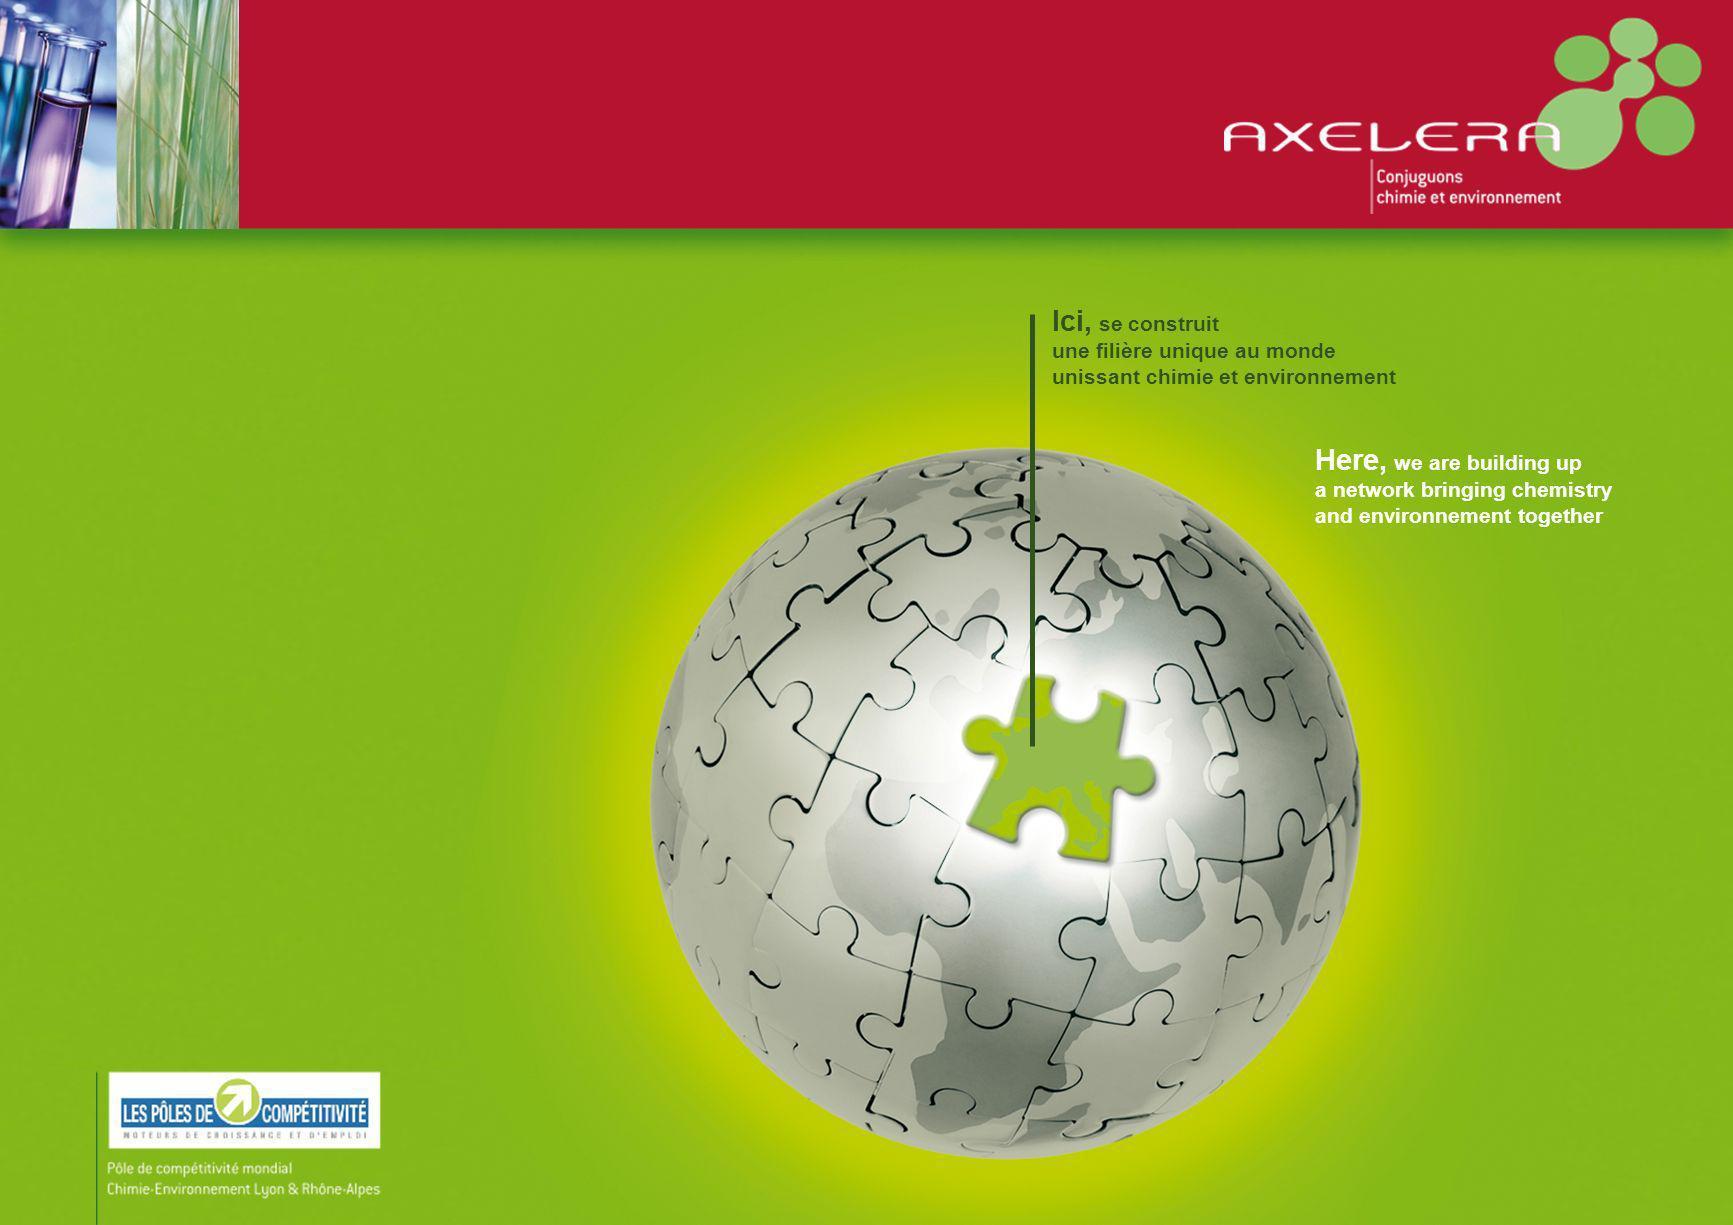 Axelera in short Axelera, a constant evolution: Assessment and demonstration International development The Axelera new strategic plan (2009-2015)